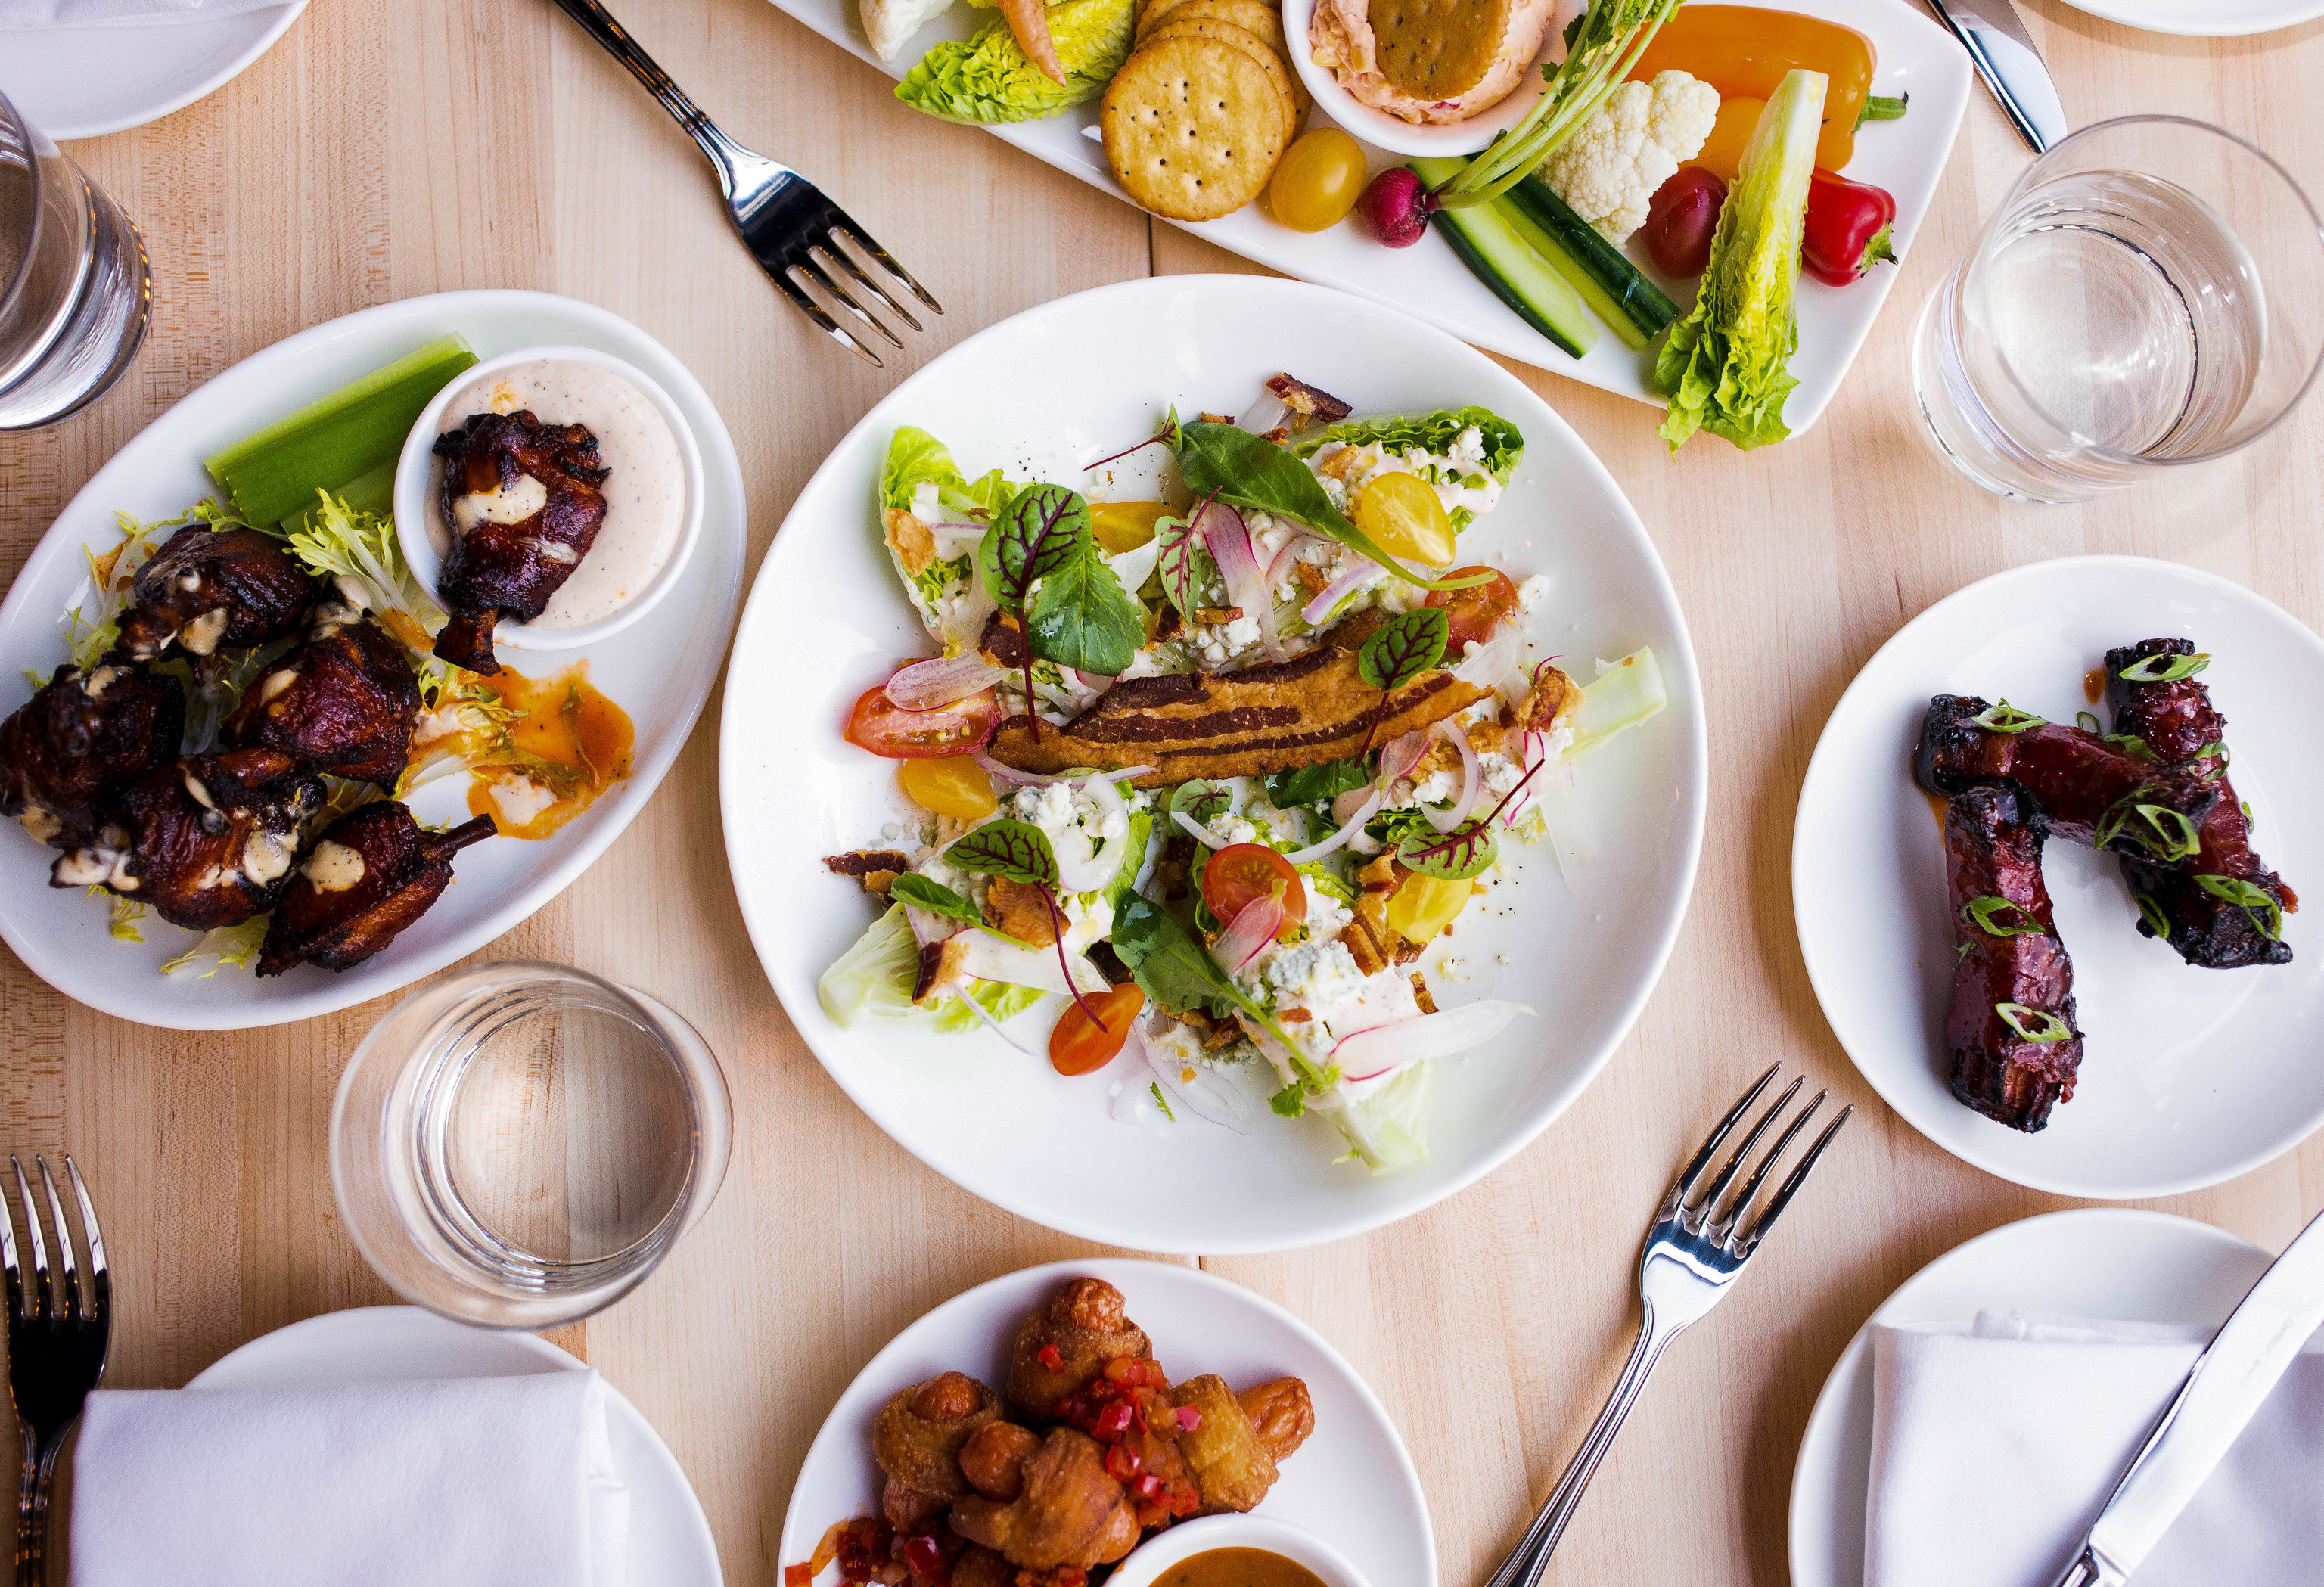 Trip Ideas Weekend Getaways plate food table dish meal lunch breakfast brunch dinner produce restaurant hors d oeuvre supper sense cuisine different several piece de resistance